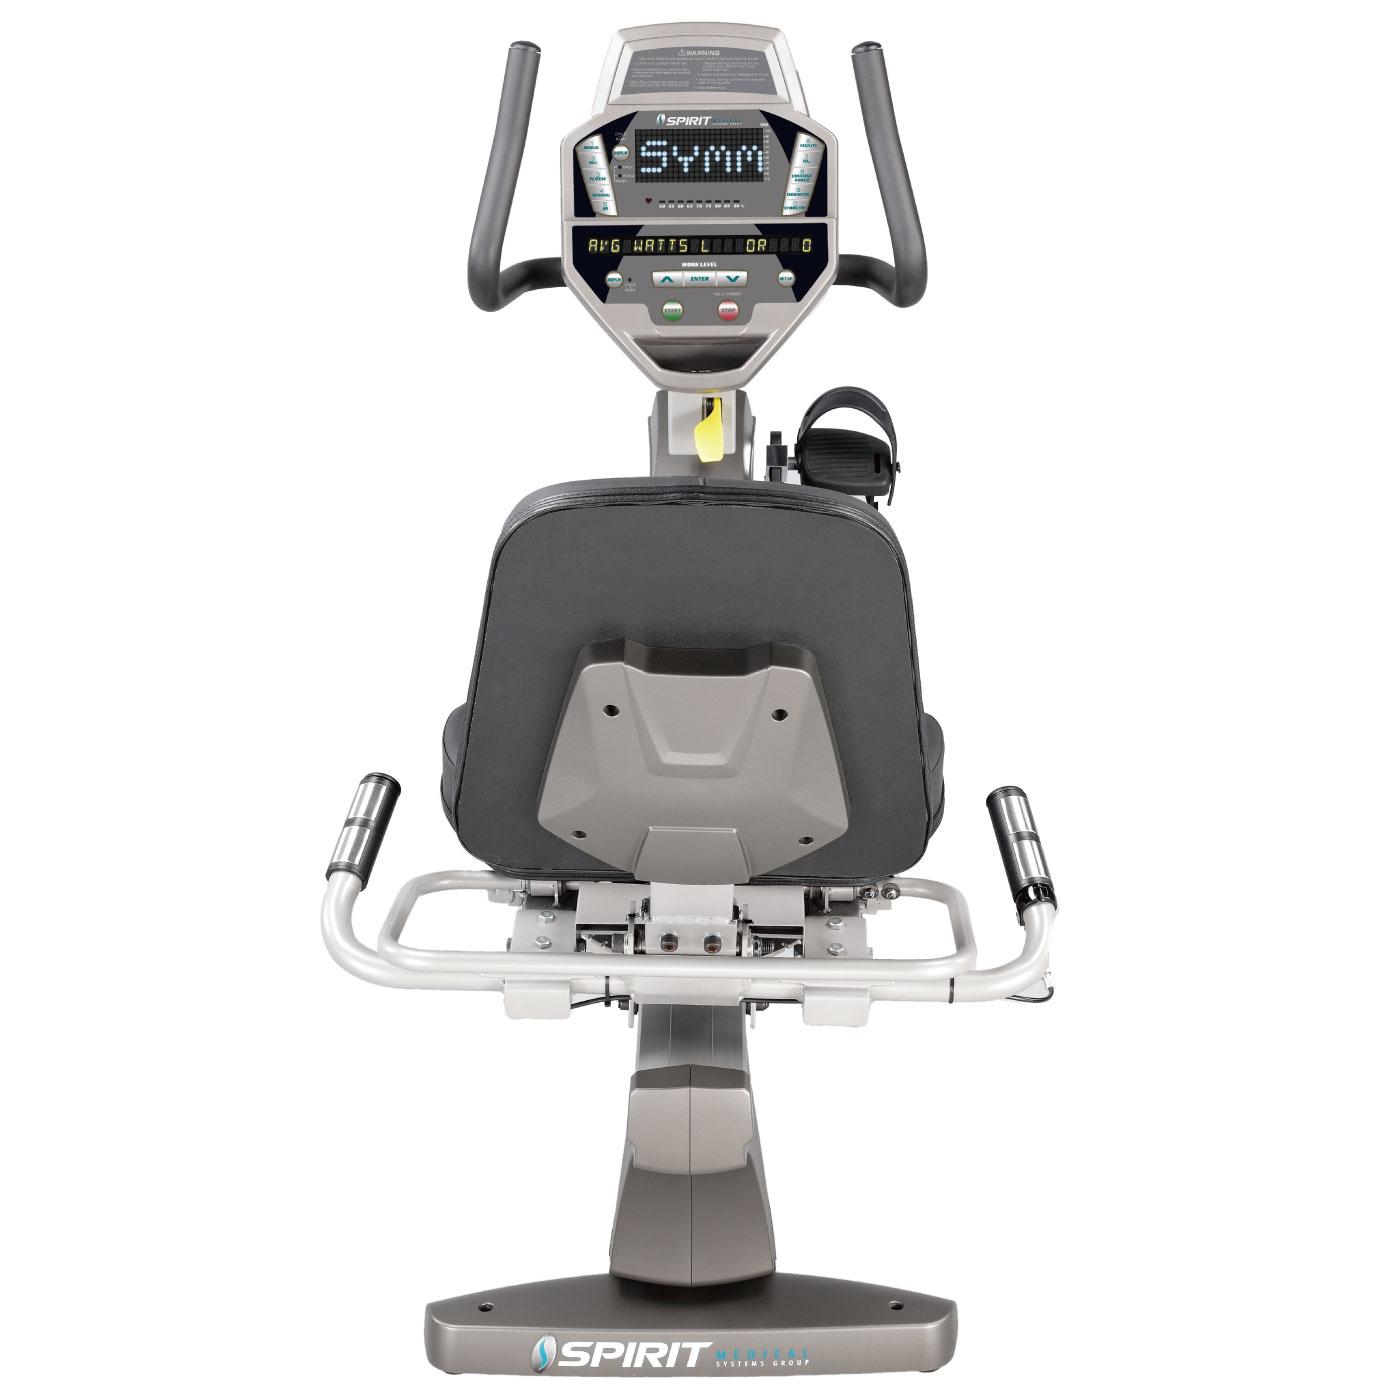 MR100/医療用(リハビリ・機能訓練向け)リカンベントバイク〈Spirit Fitness〉《ダイヤコ》